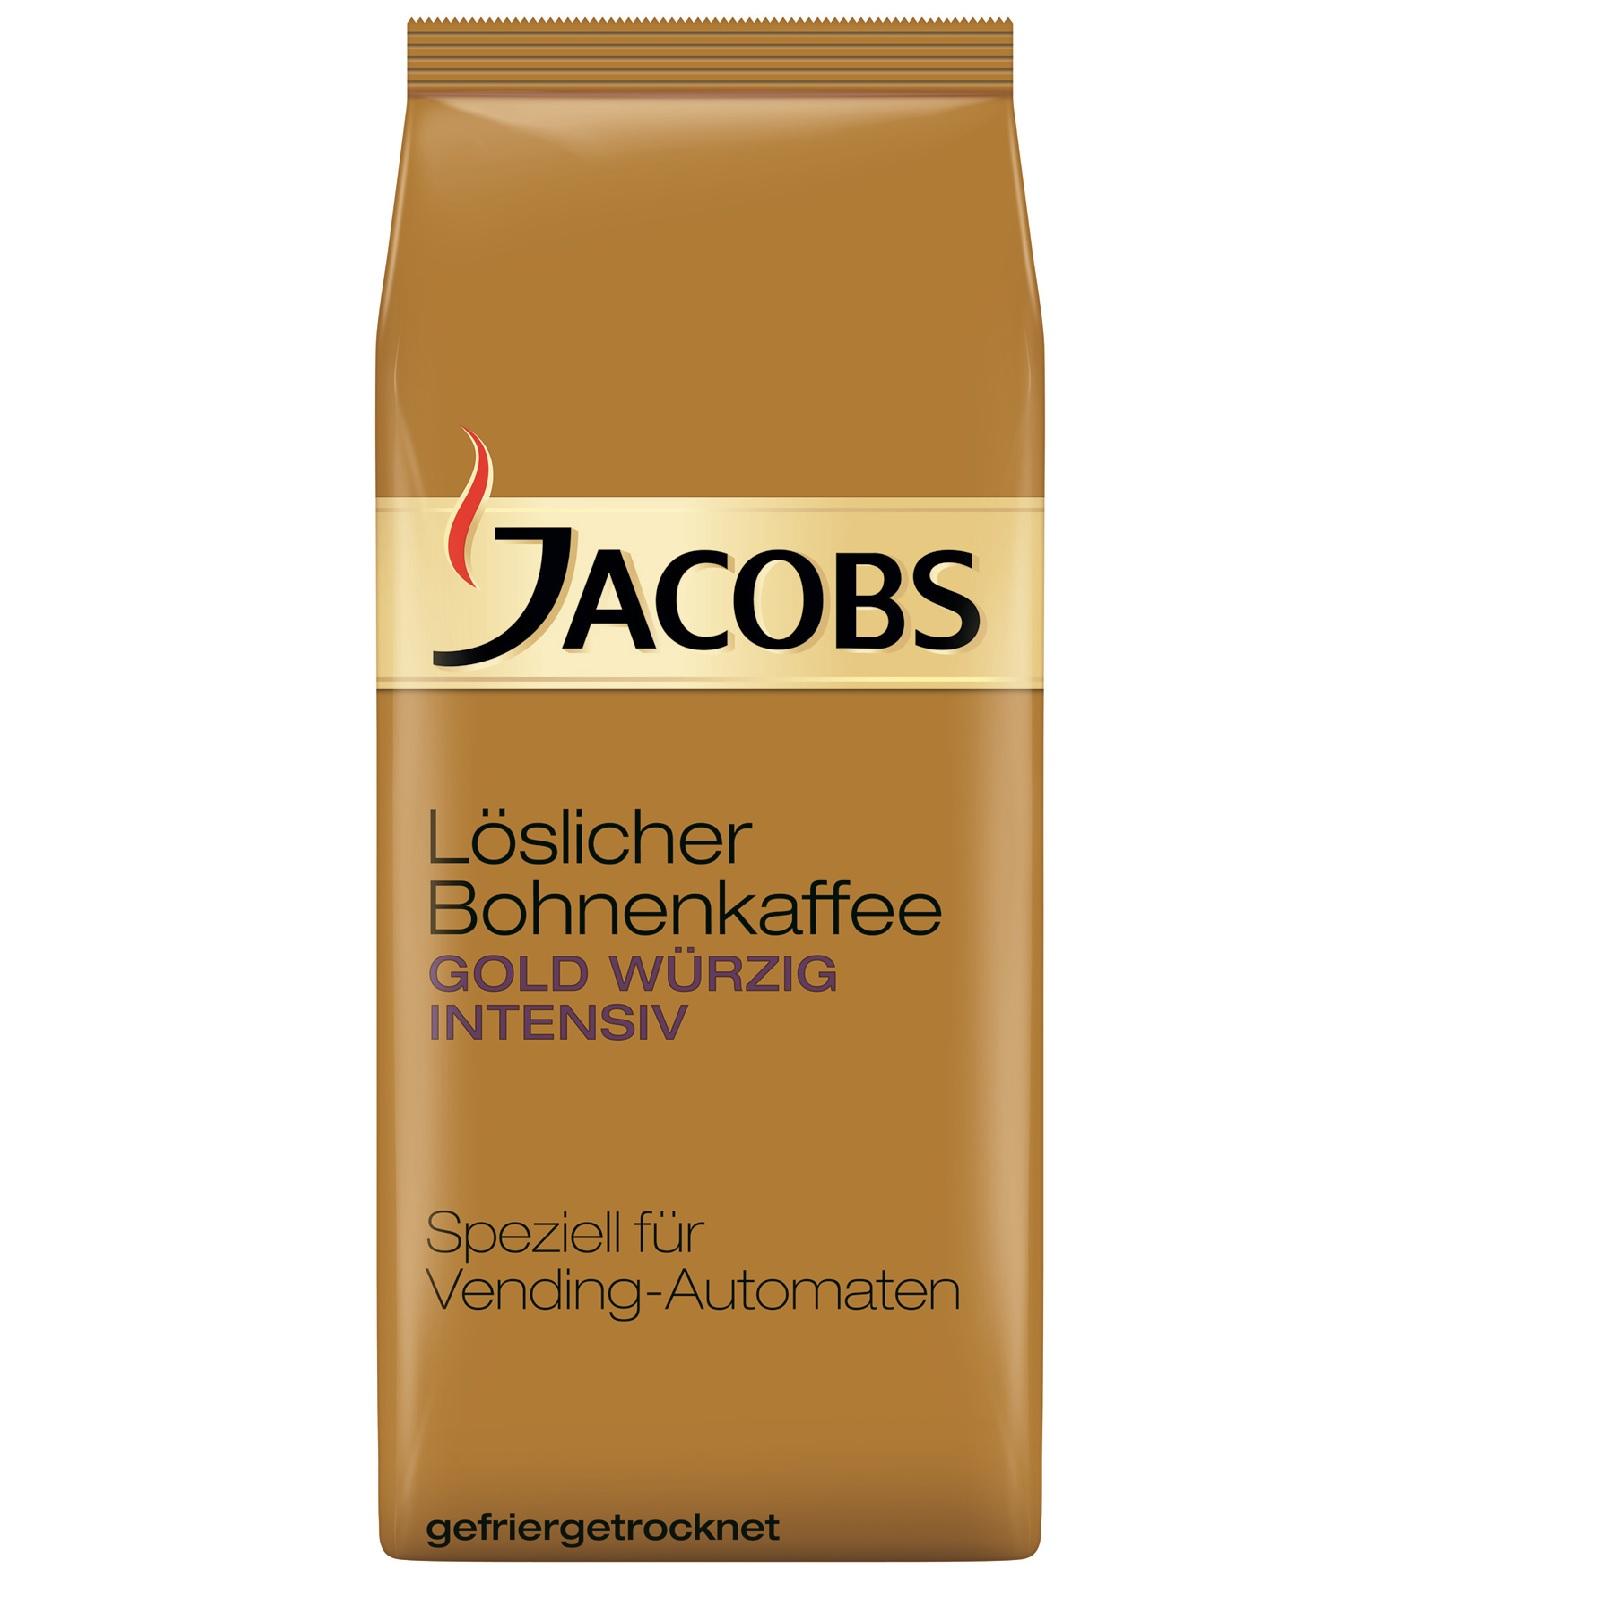 Jacobs Gold würzig Intensiv 8 x 500g Instant-Kaffee